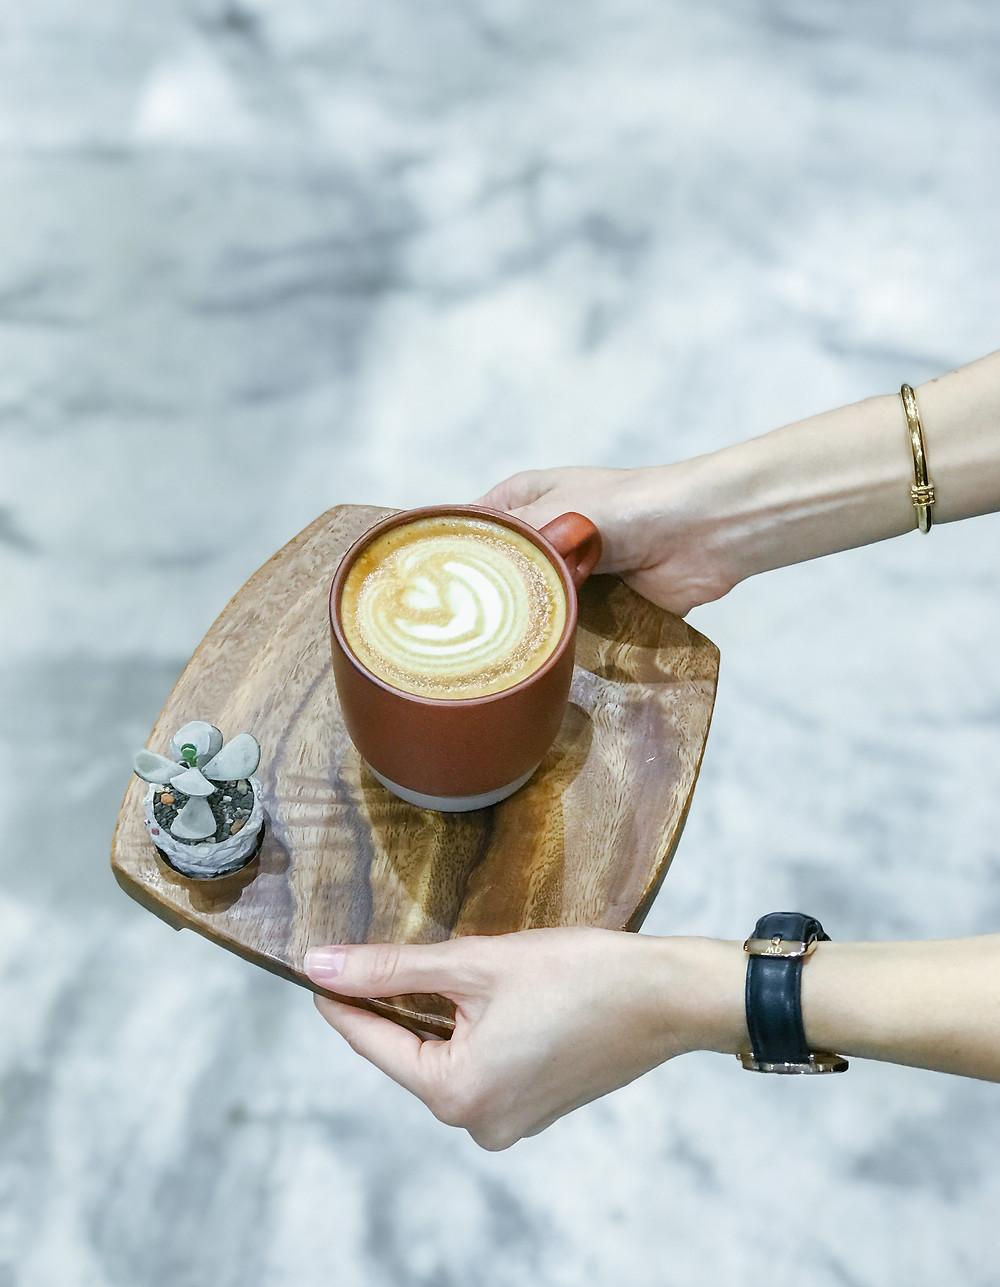 有肉 SUCCULAND Succulent & Gift (Coffee Sind)